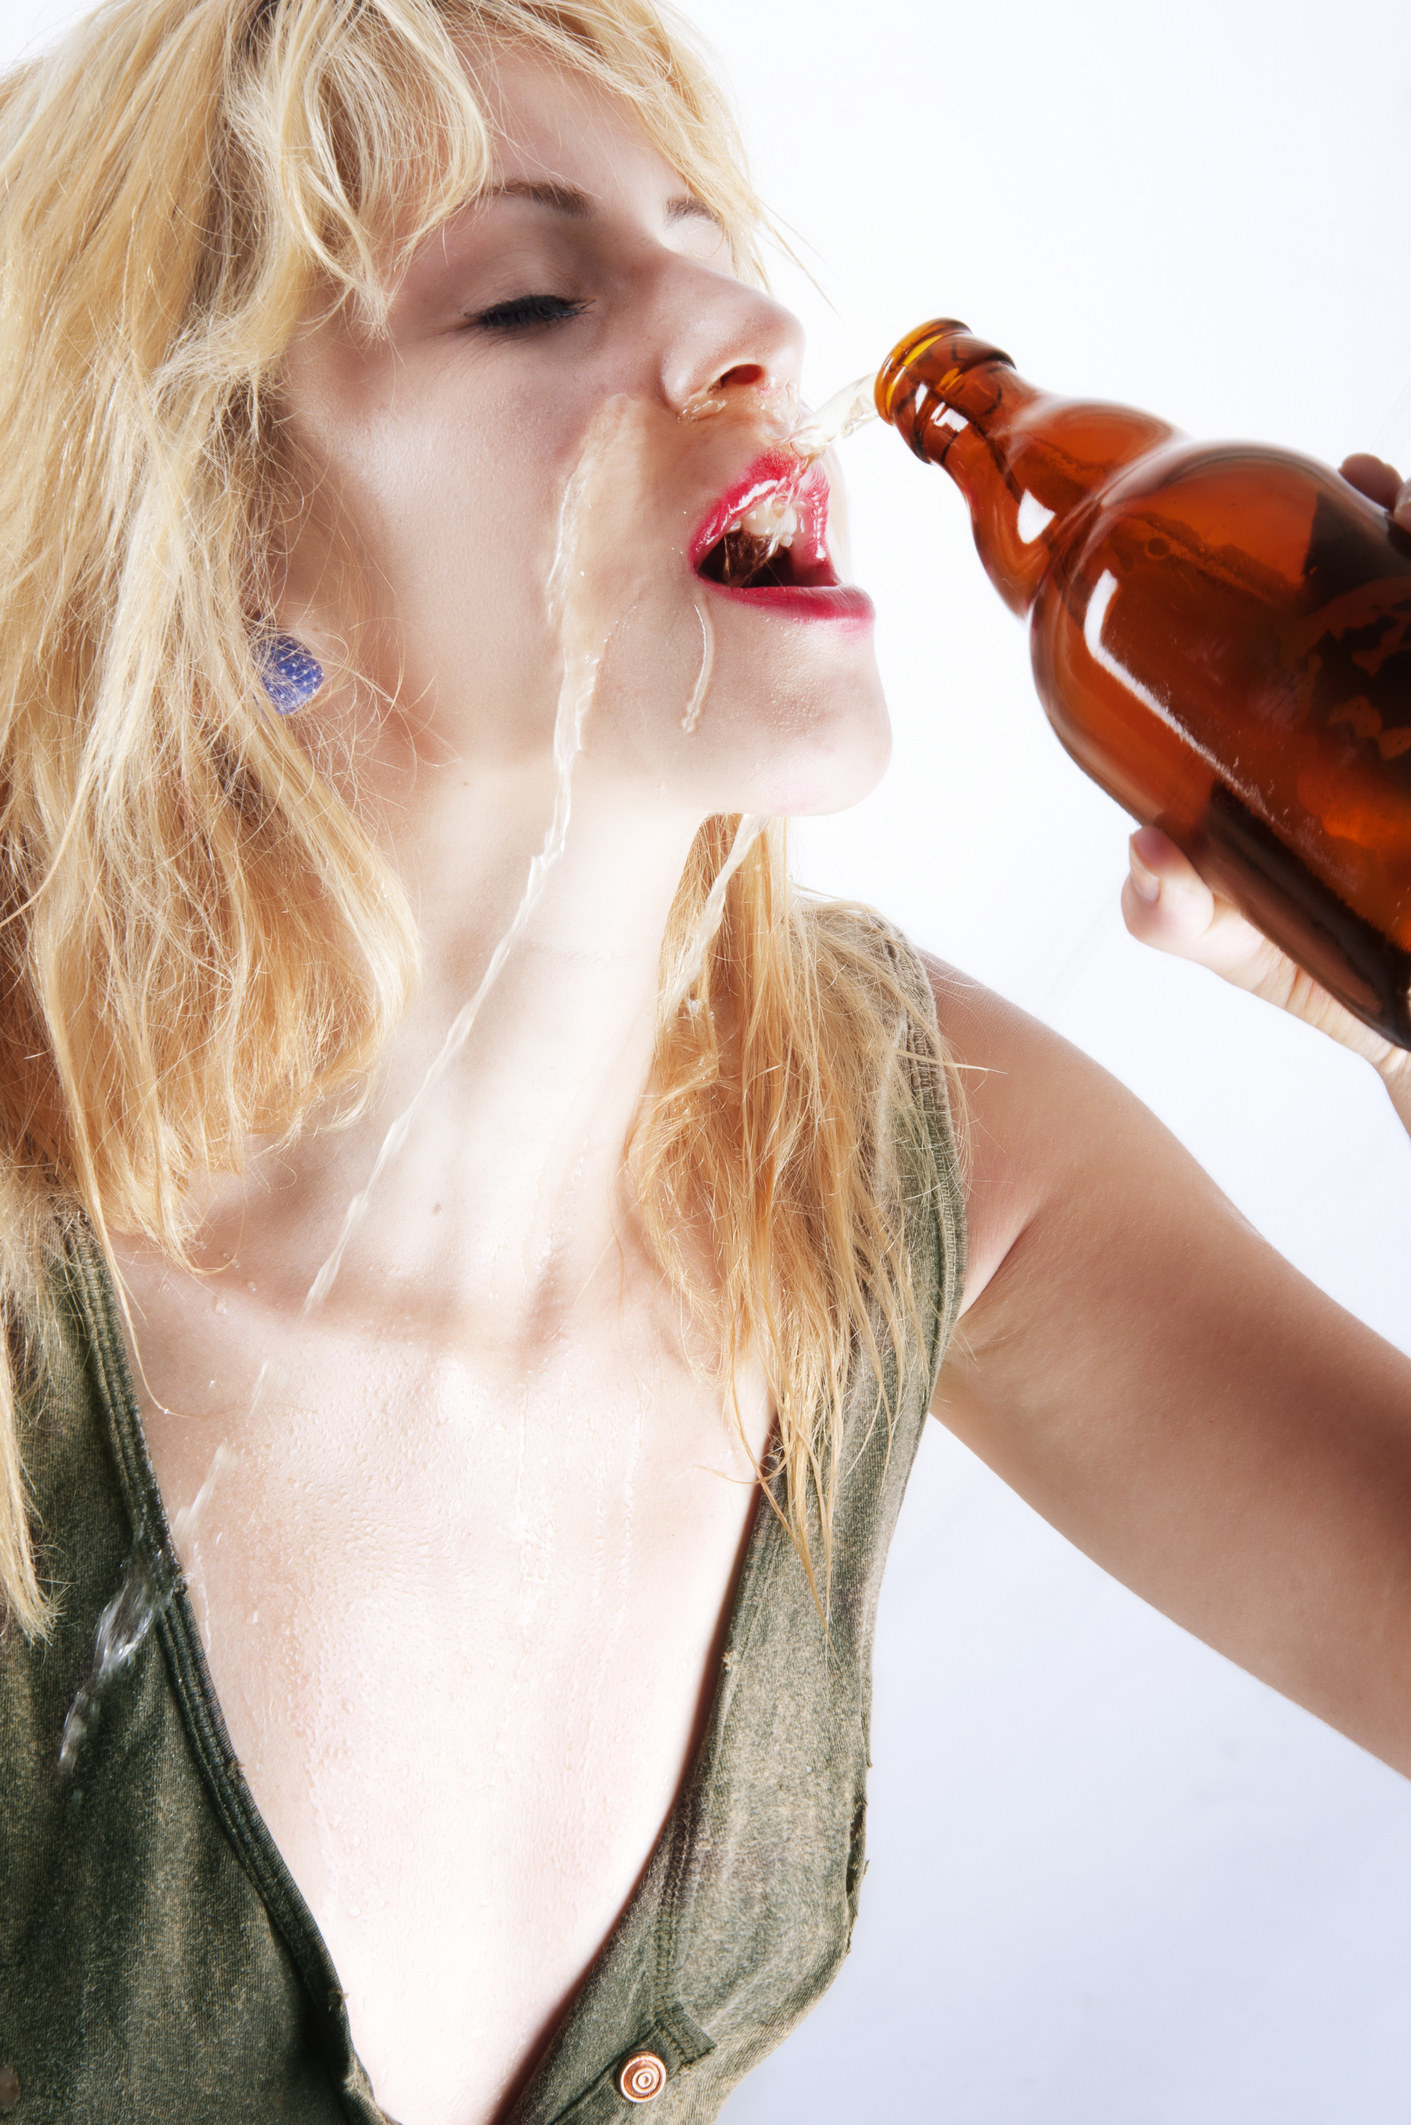 hot-girls-drinking-beer-huge-anal-porn-videos